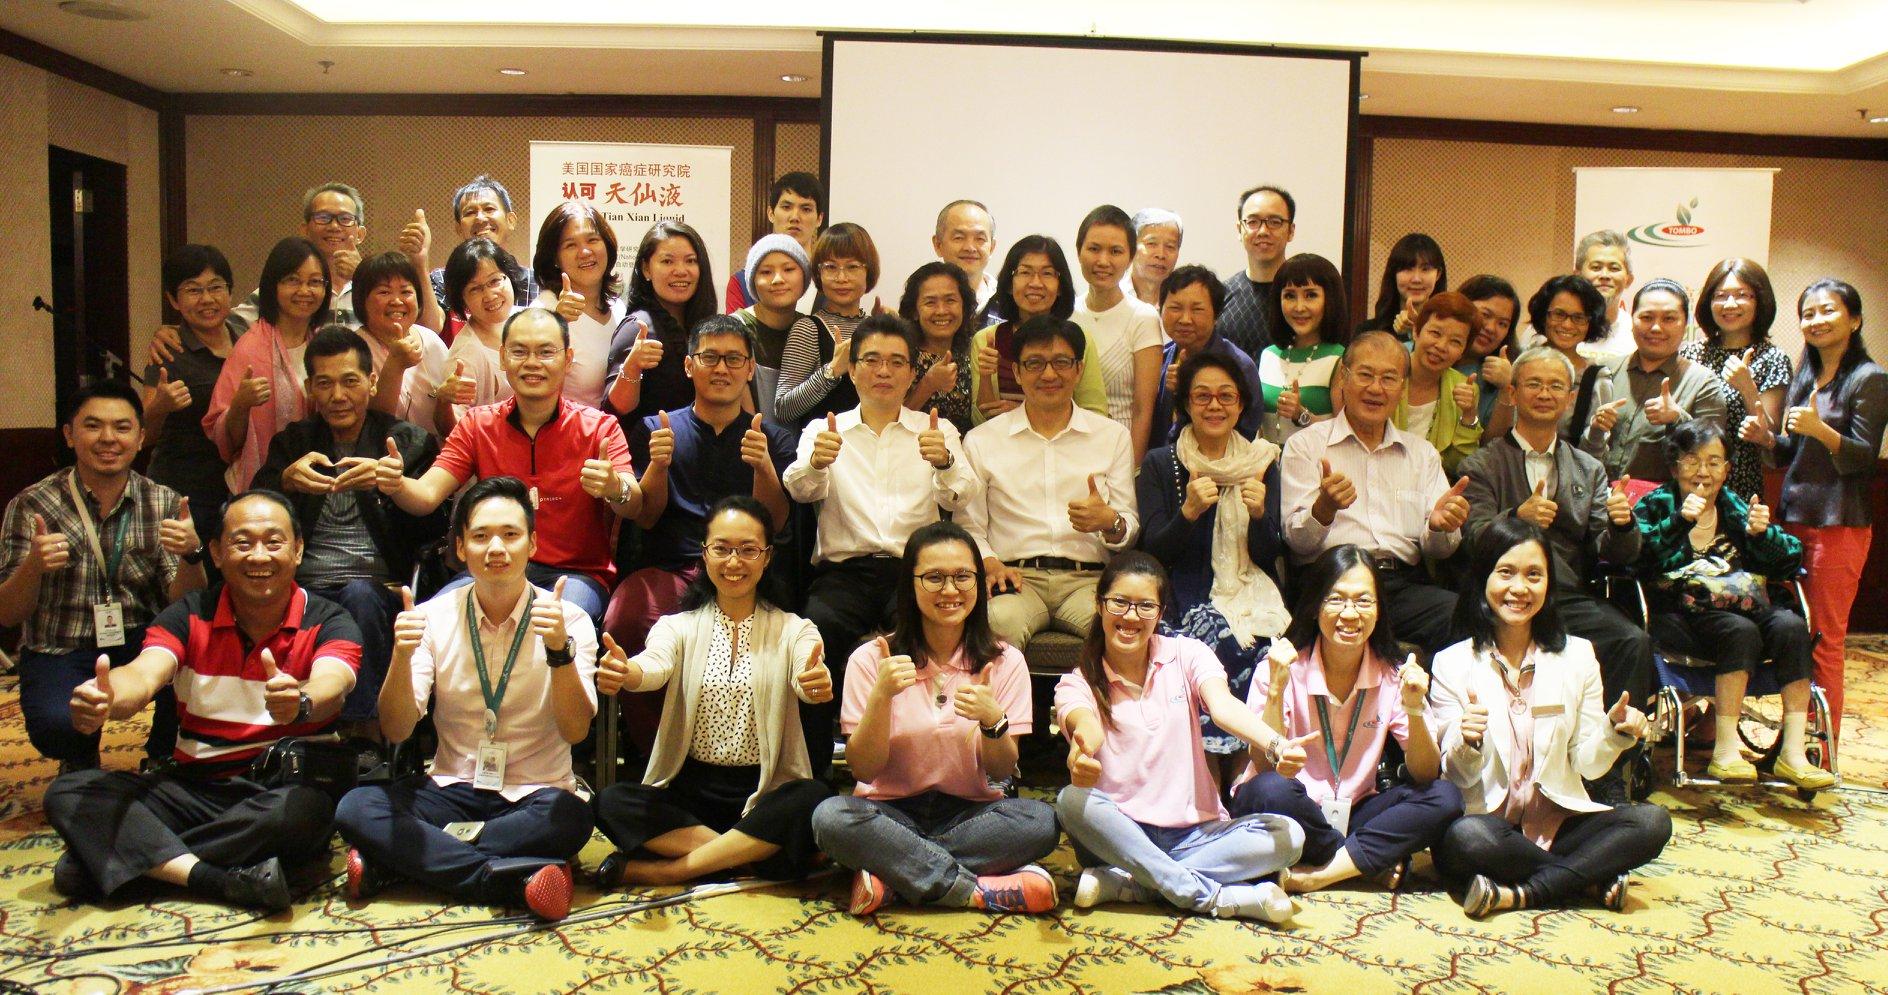 Acara Tian Xian Malaysia